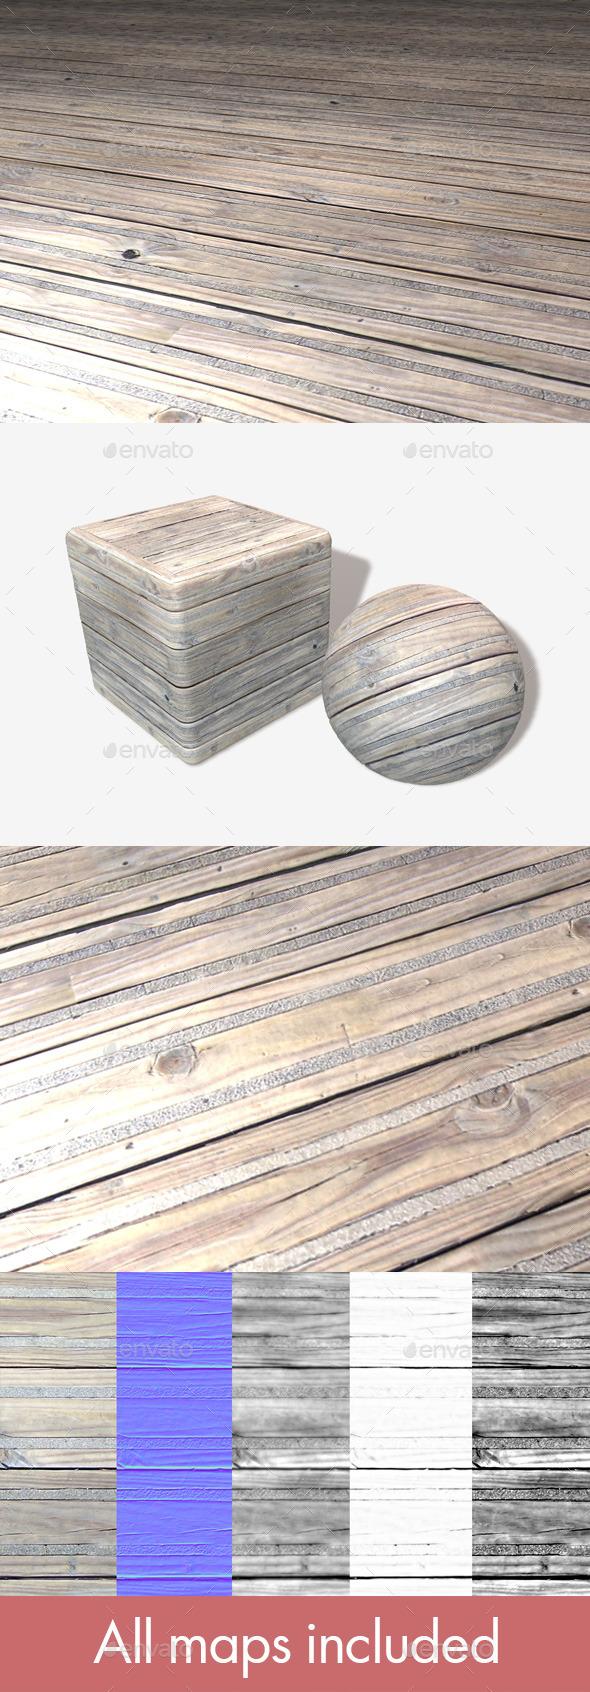 Wooden Floor Grip Panels Seamless Texture - 3DOcean Item for Sale